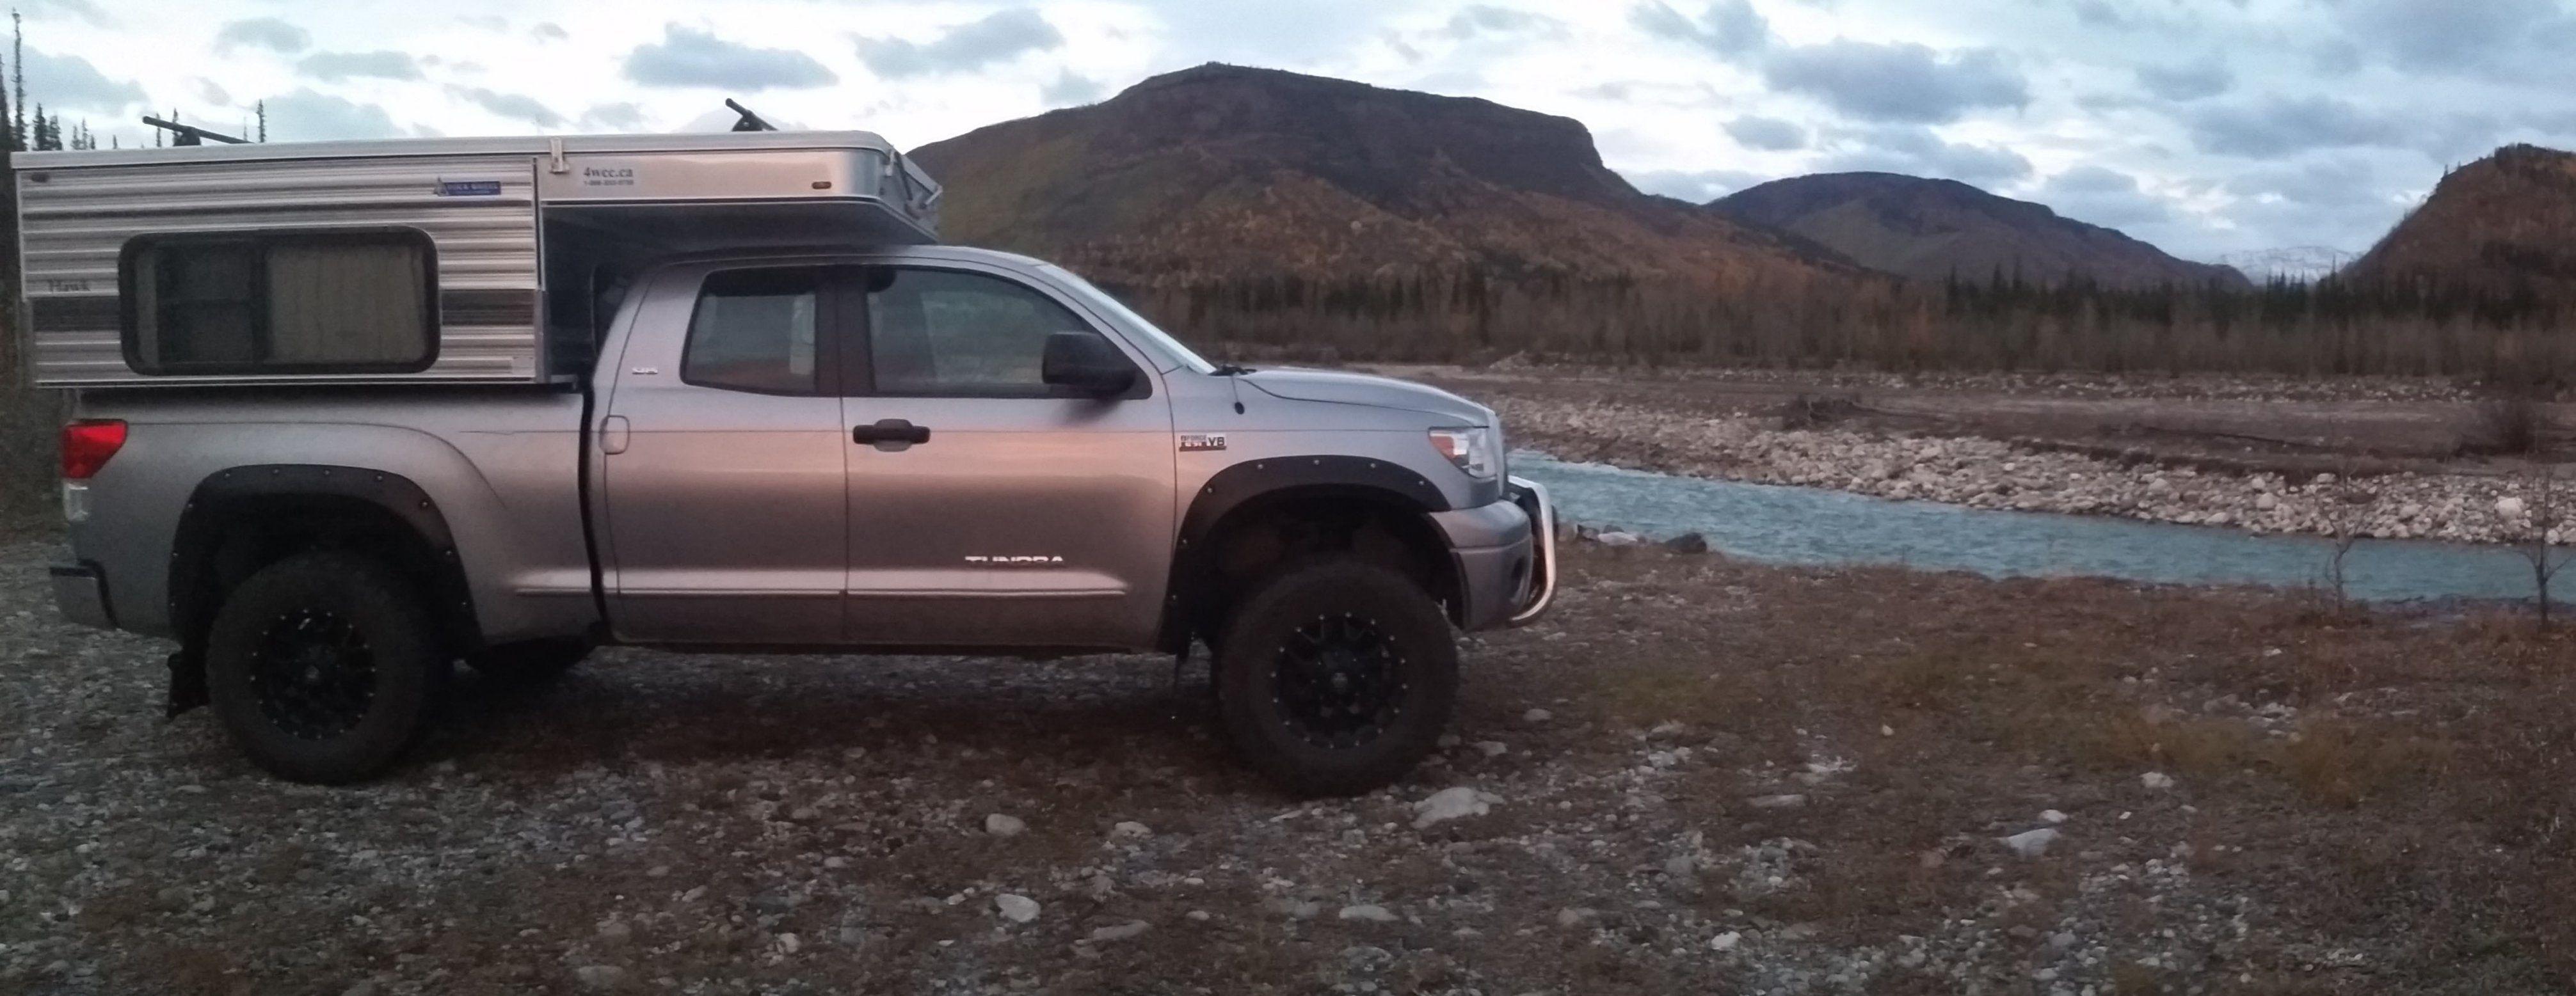 Yukondolt S 2011 Tundra With 2015 Fwc Hawk Silver Spur Truck Camper Trucks Camper